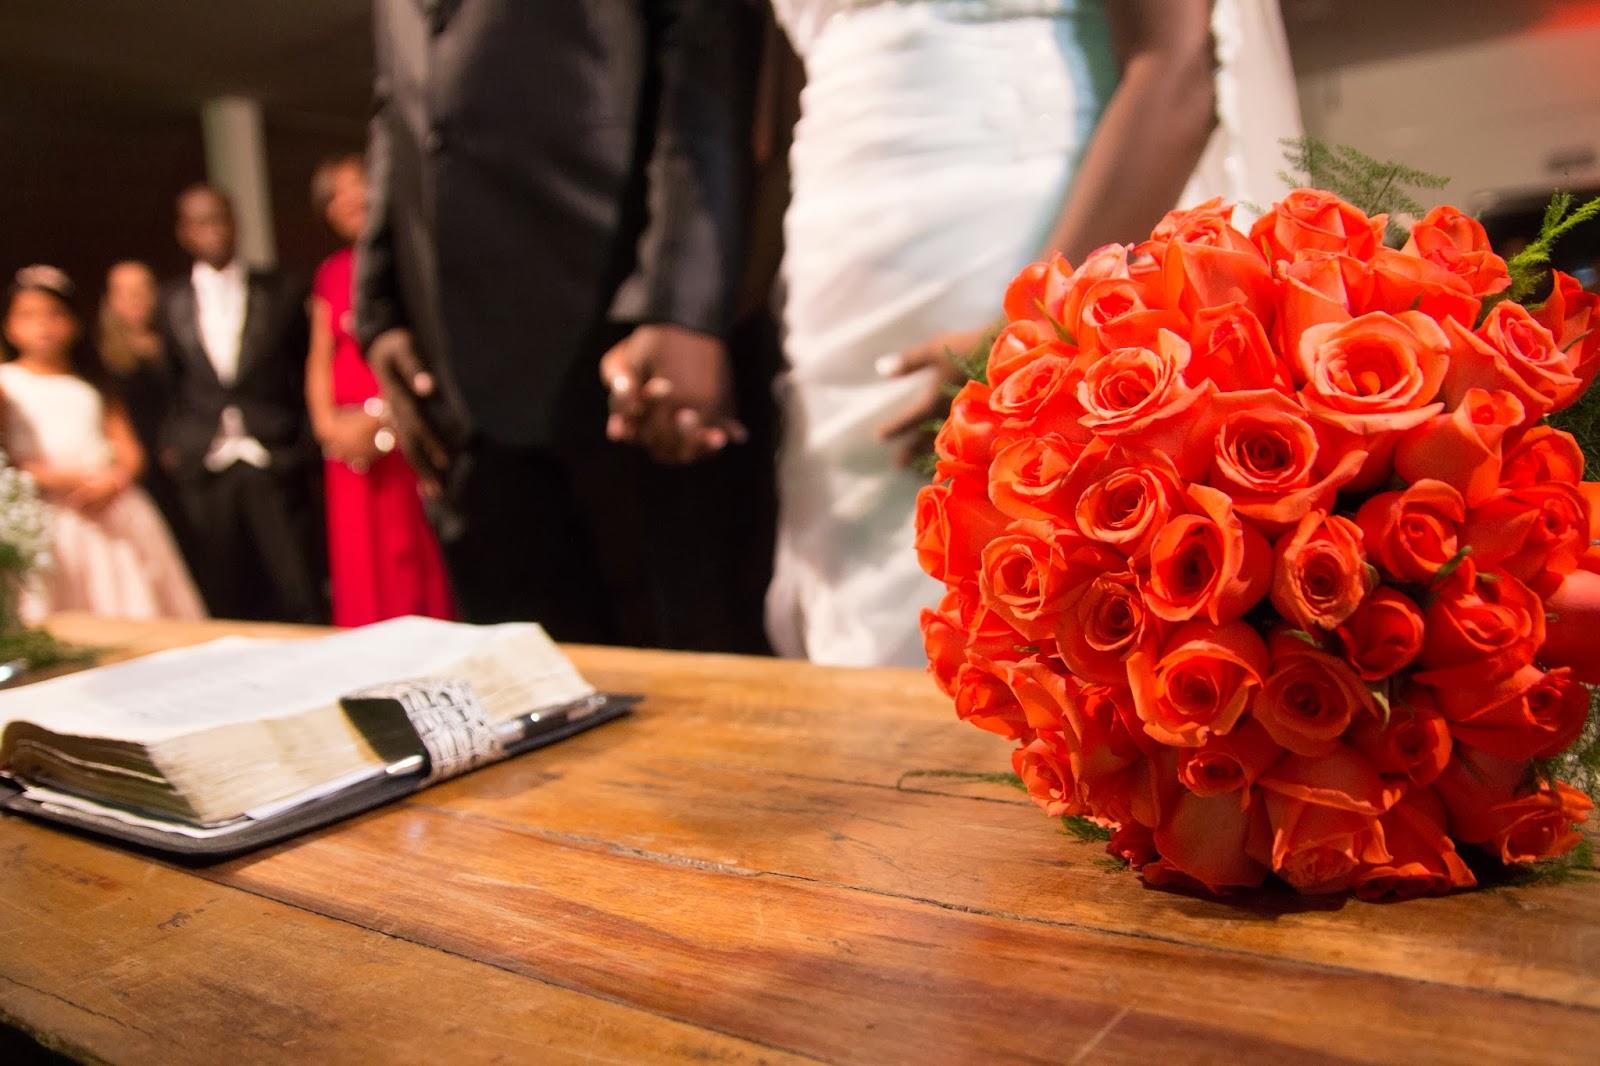 historia-amor-fe-cerimonia-noivos-bouquet-biblia